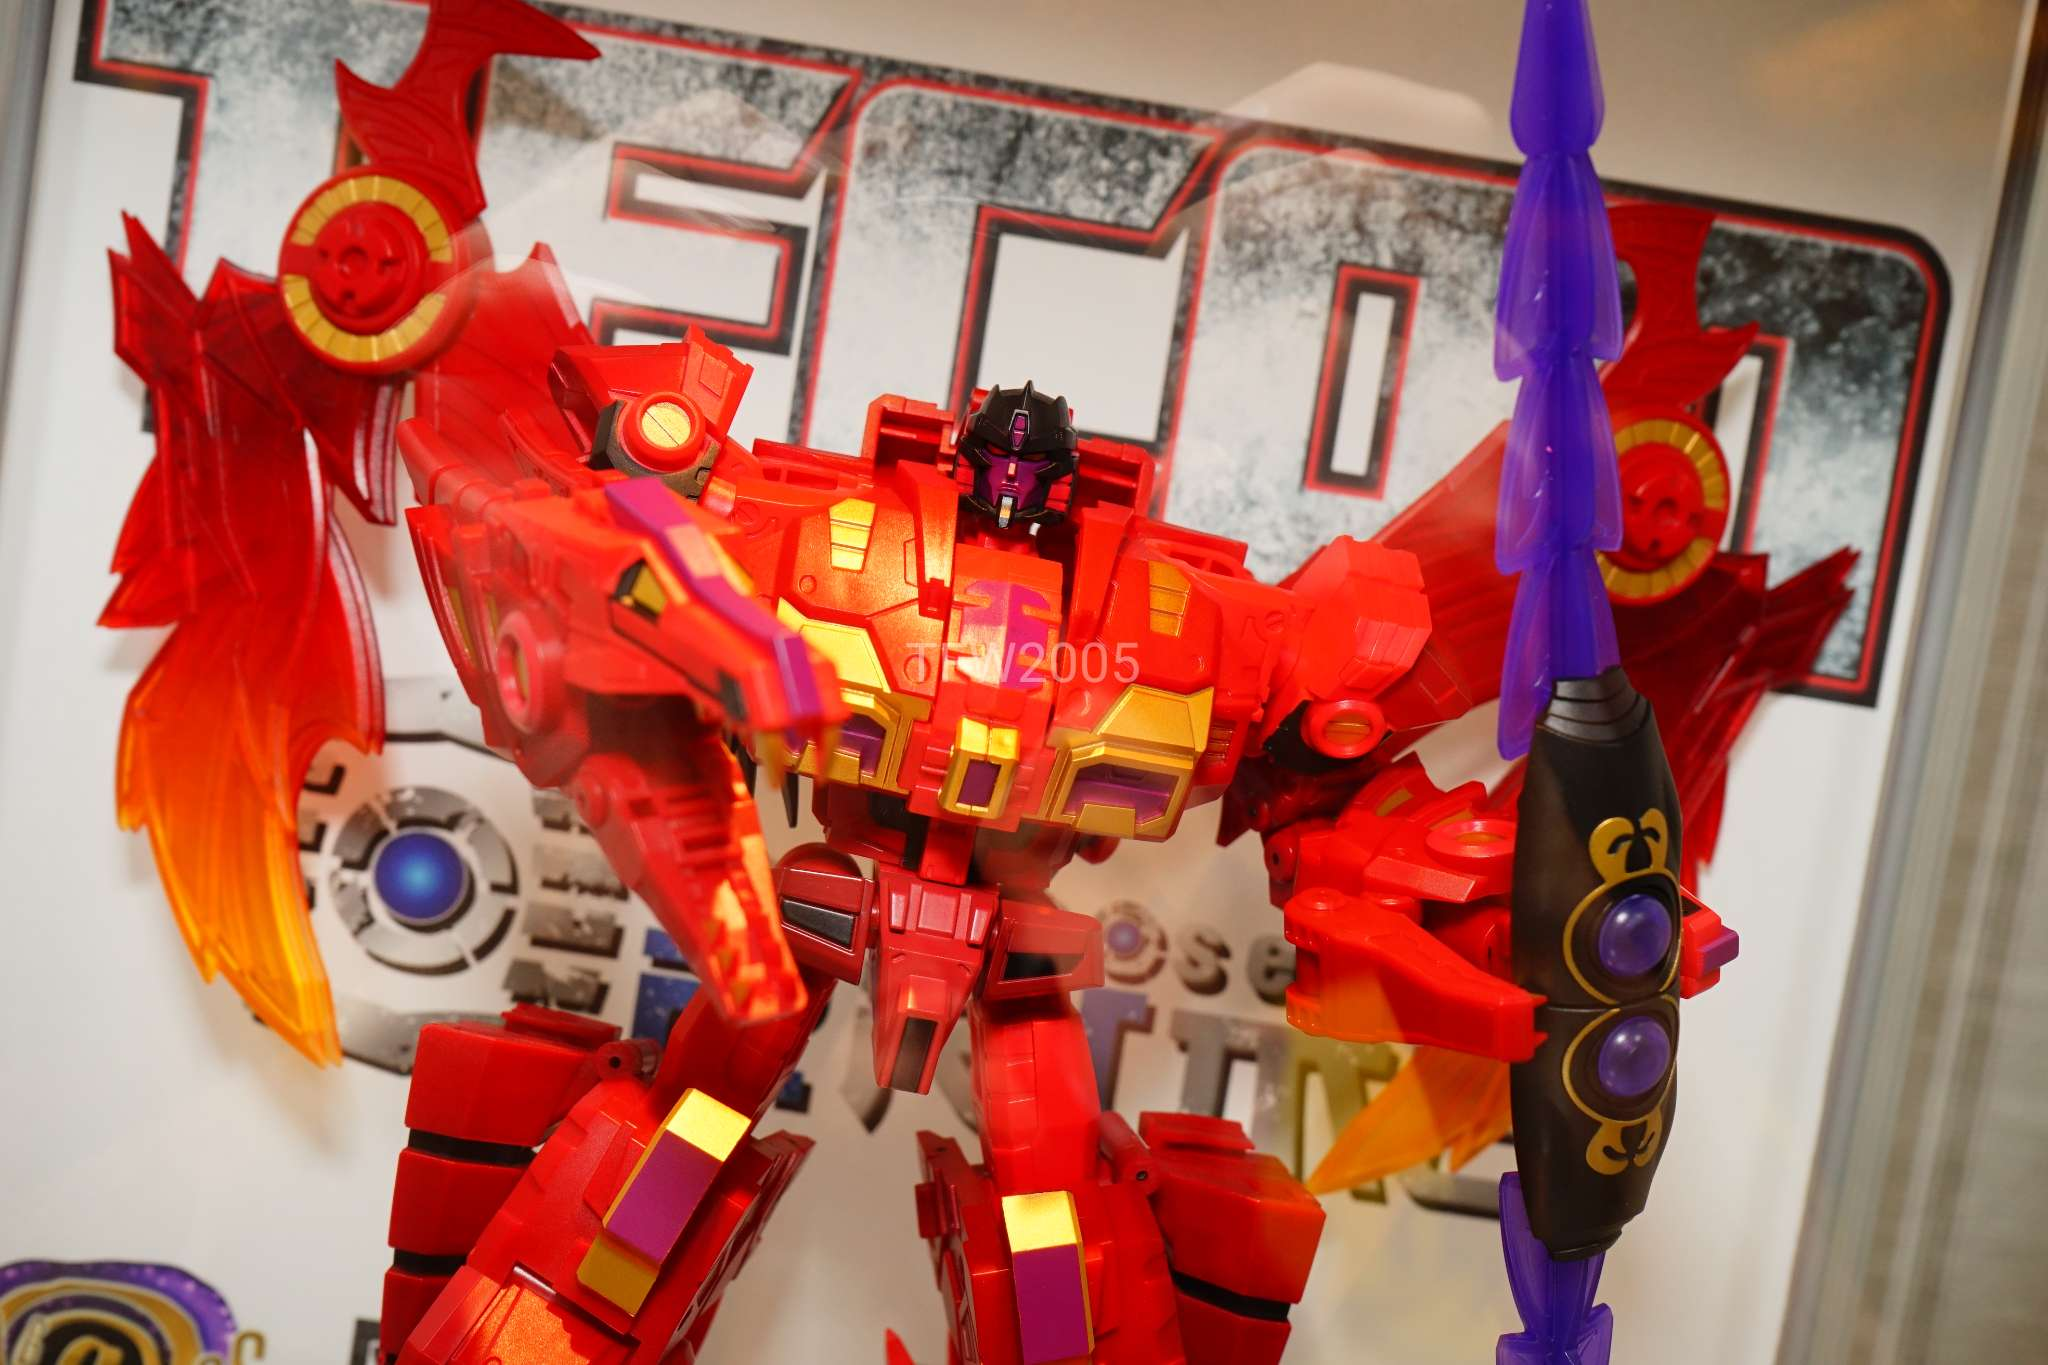 [FansHobby] Produit Tiers - Master Builder MB-03A Red Dragon - aka Transmetal 2 Mégatron (Beast Wars S3) ZkcXVglr_o